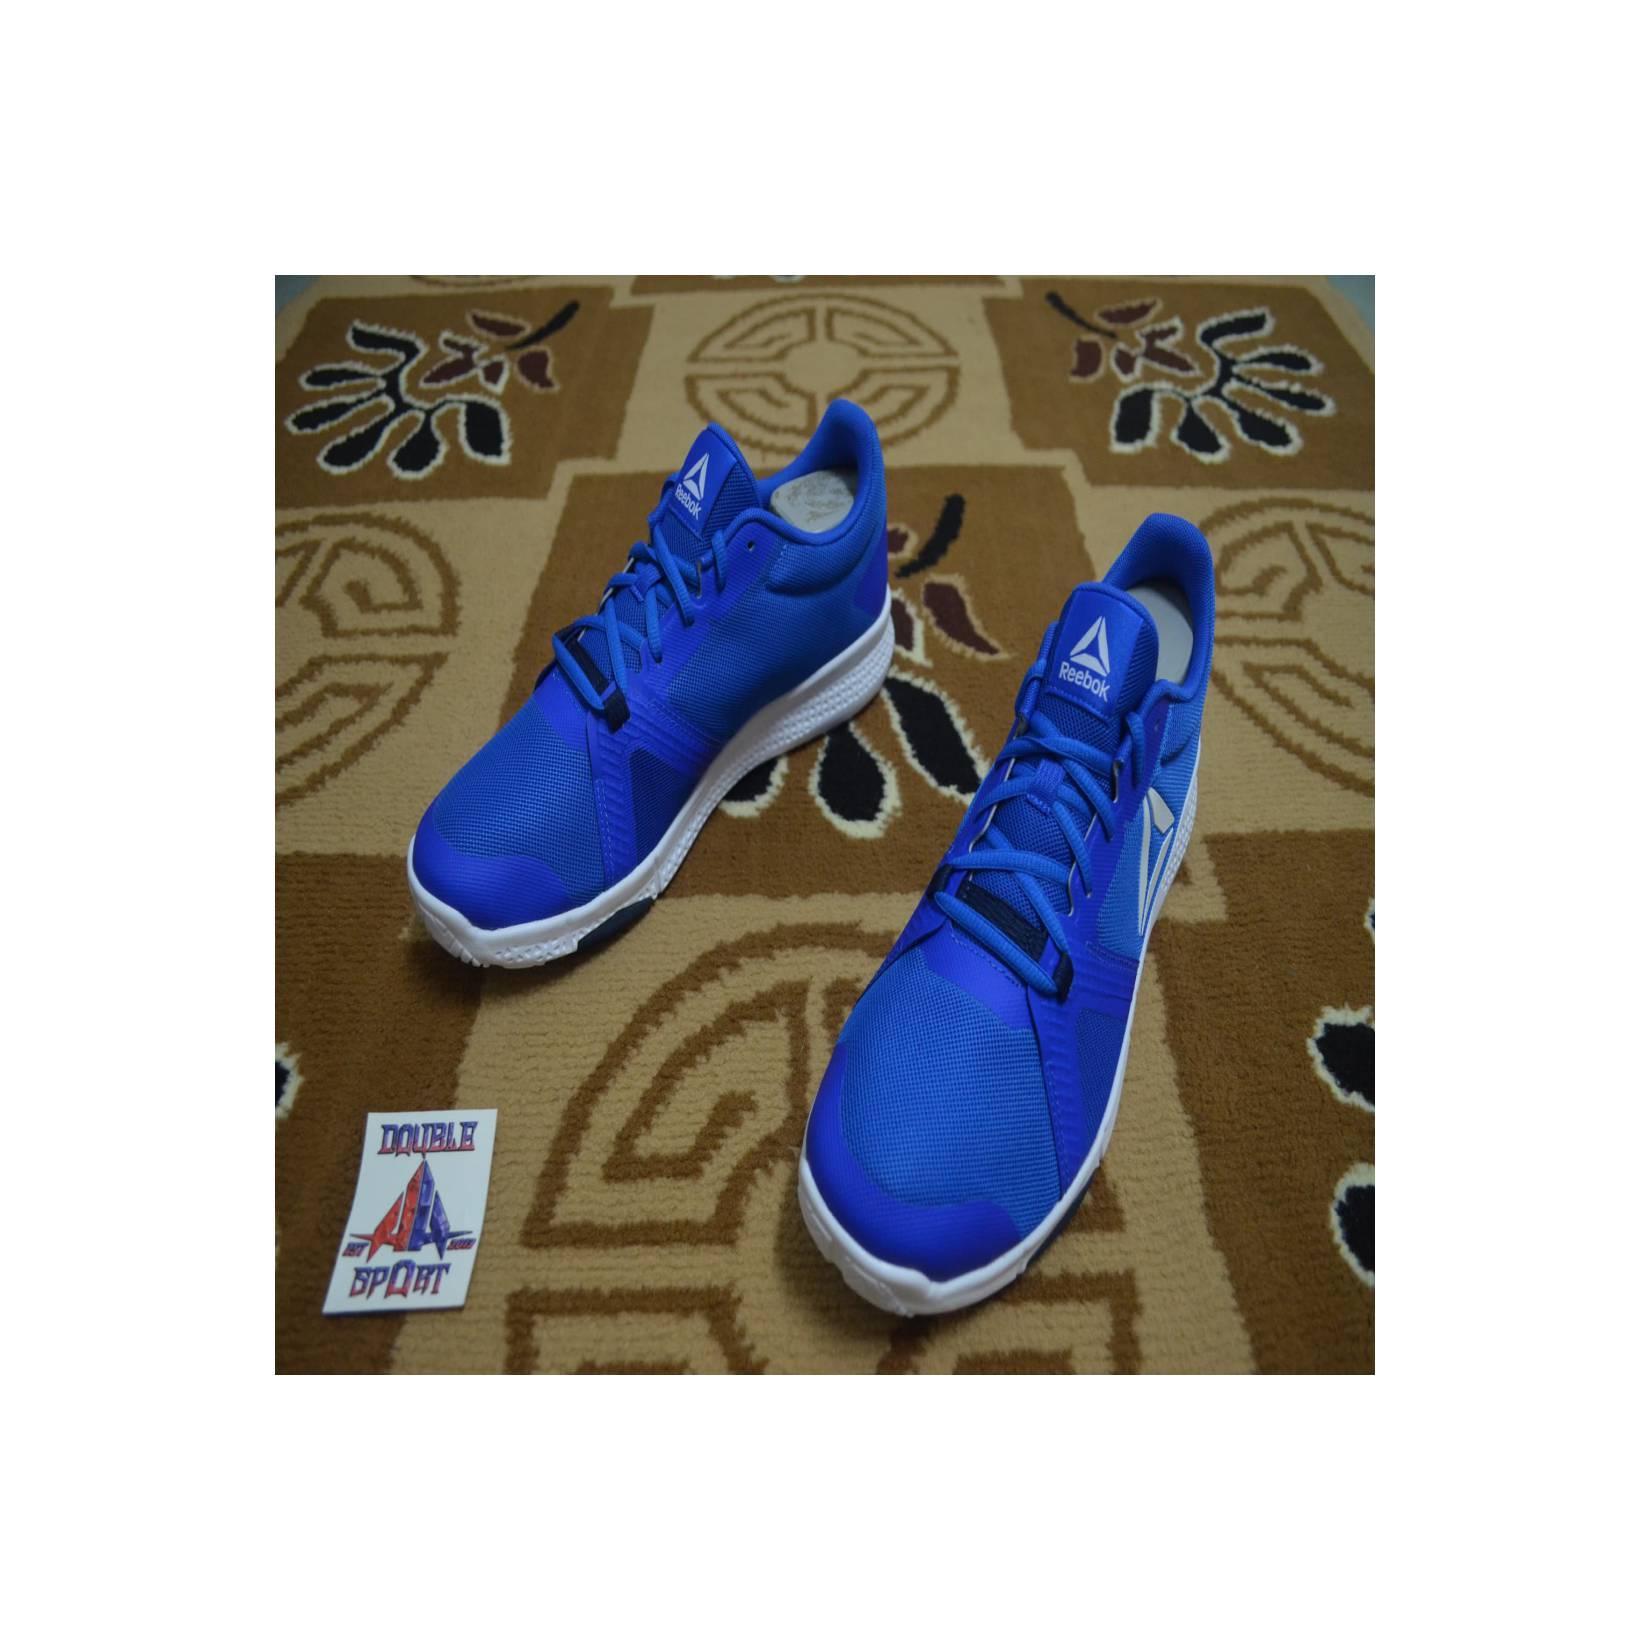 Sepatu Running / Olahraga Reebok Flexile Original Murah Not Nike Puma